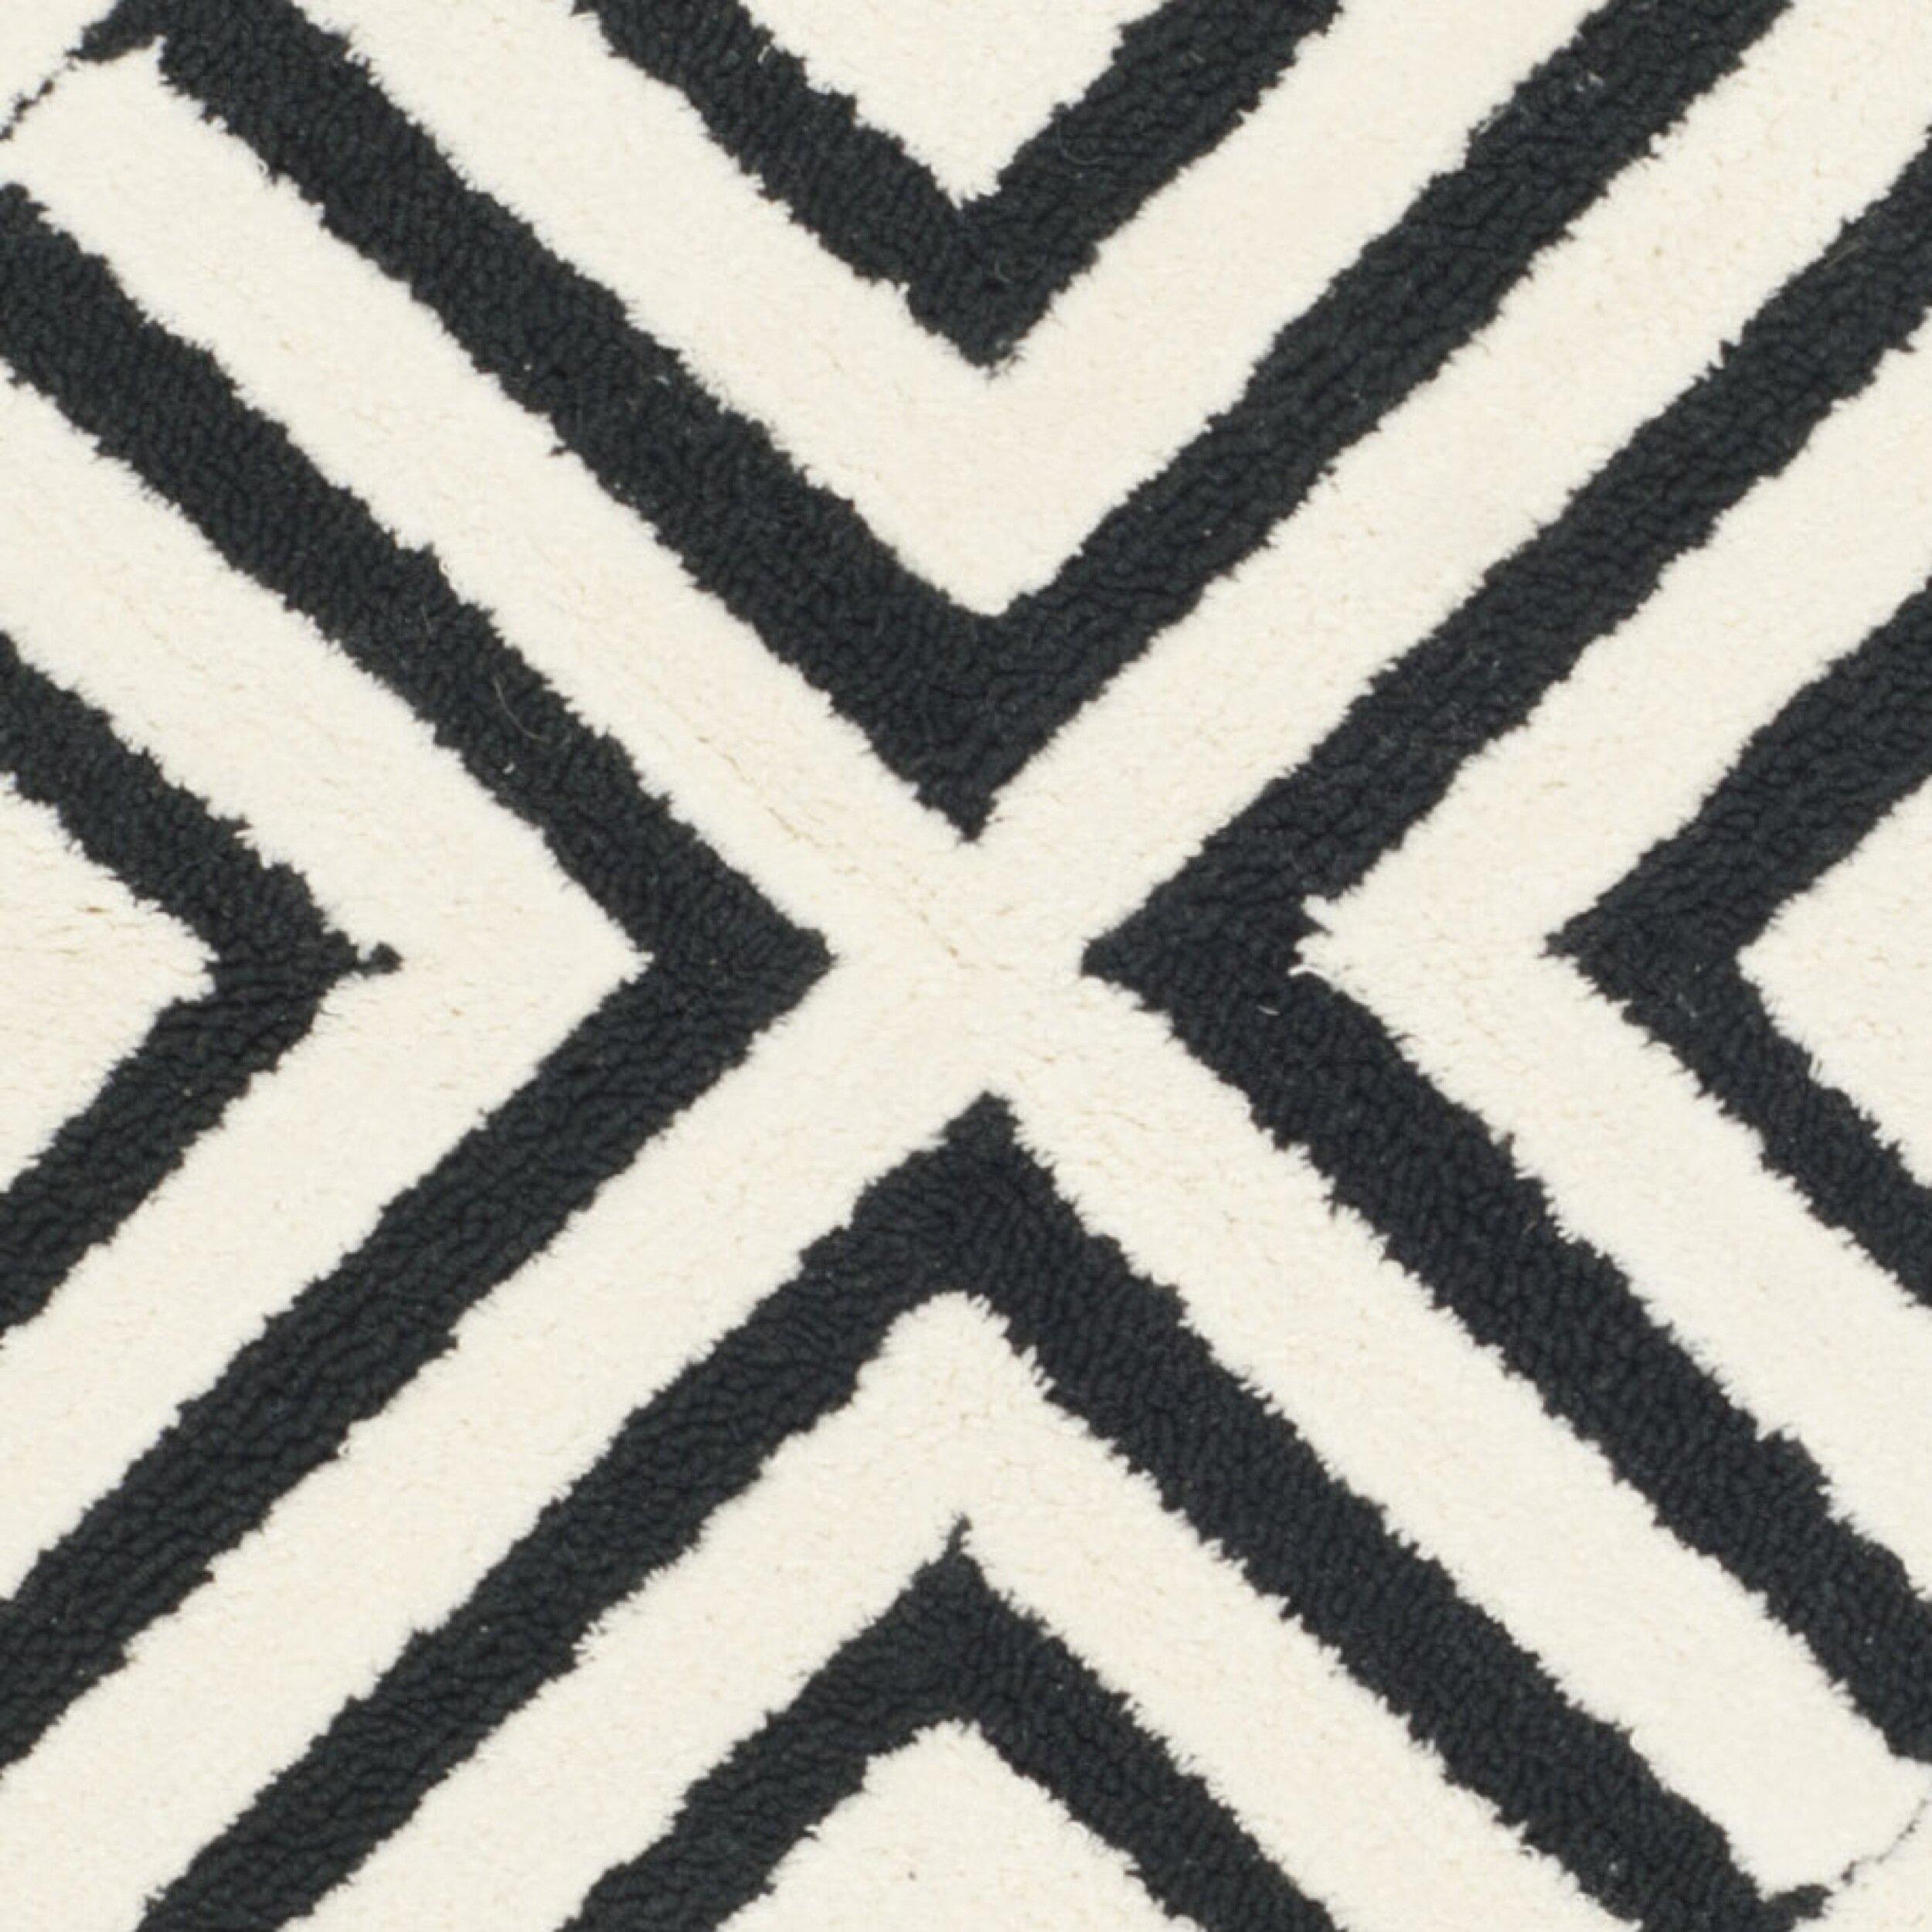 Safavieh Newport Black White Geometric Area Rug Amp Reviews